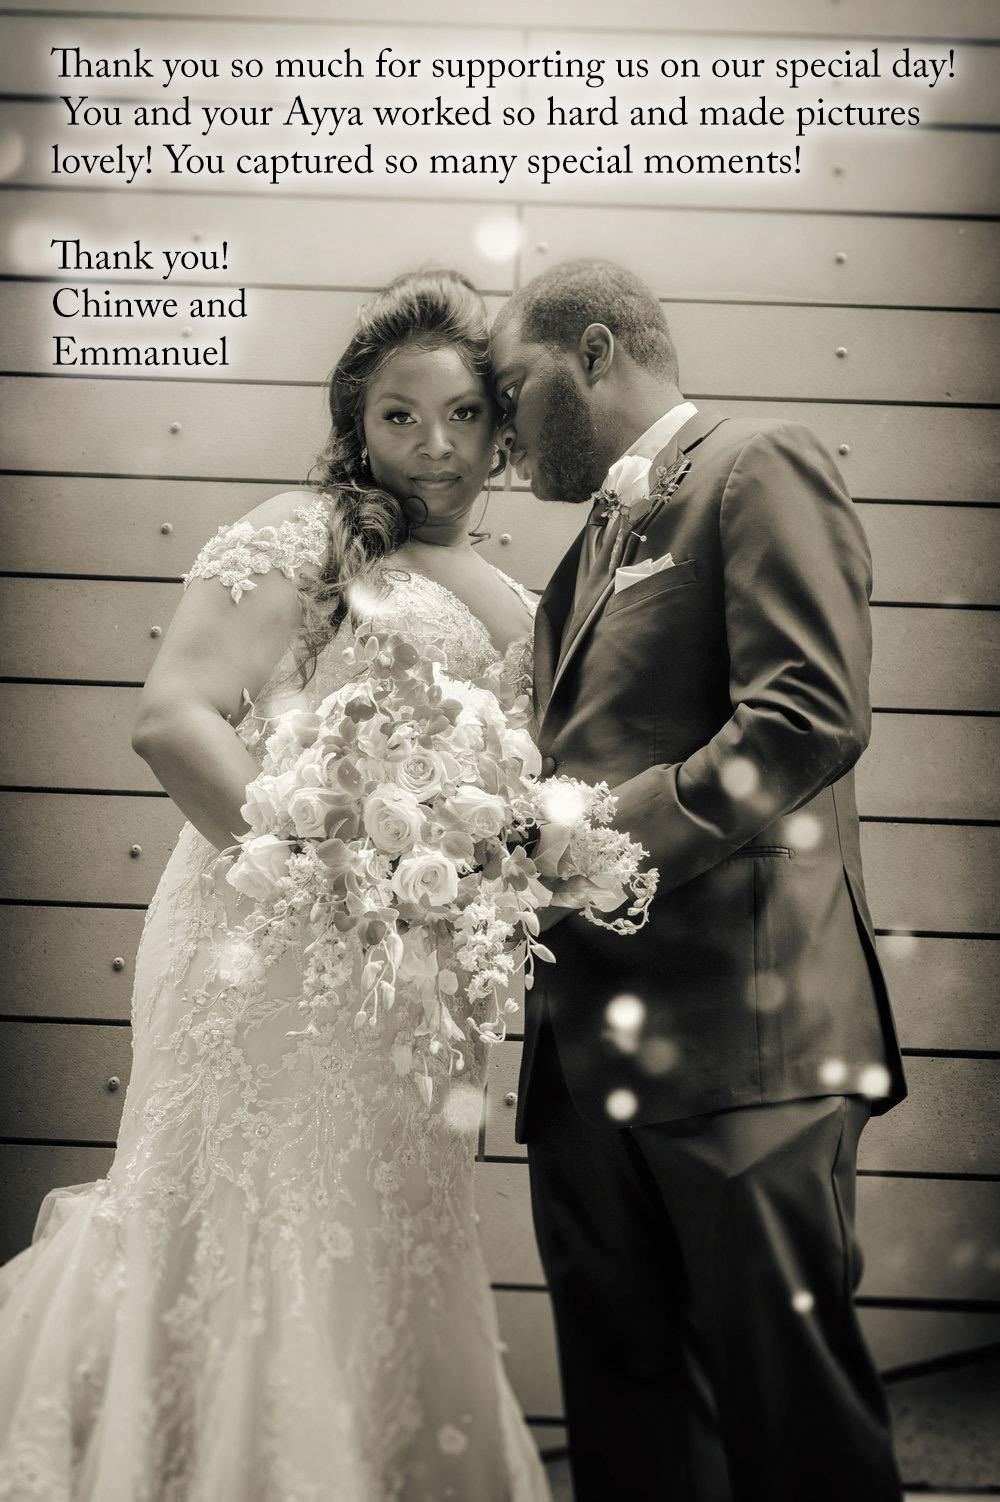 Wedding+9-2-2017-1546fx6+www copy1.jpg